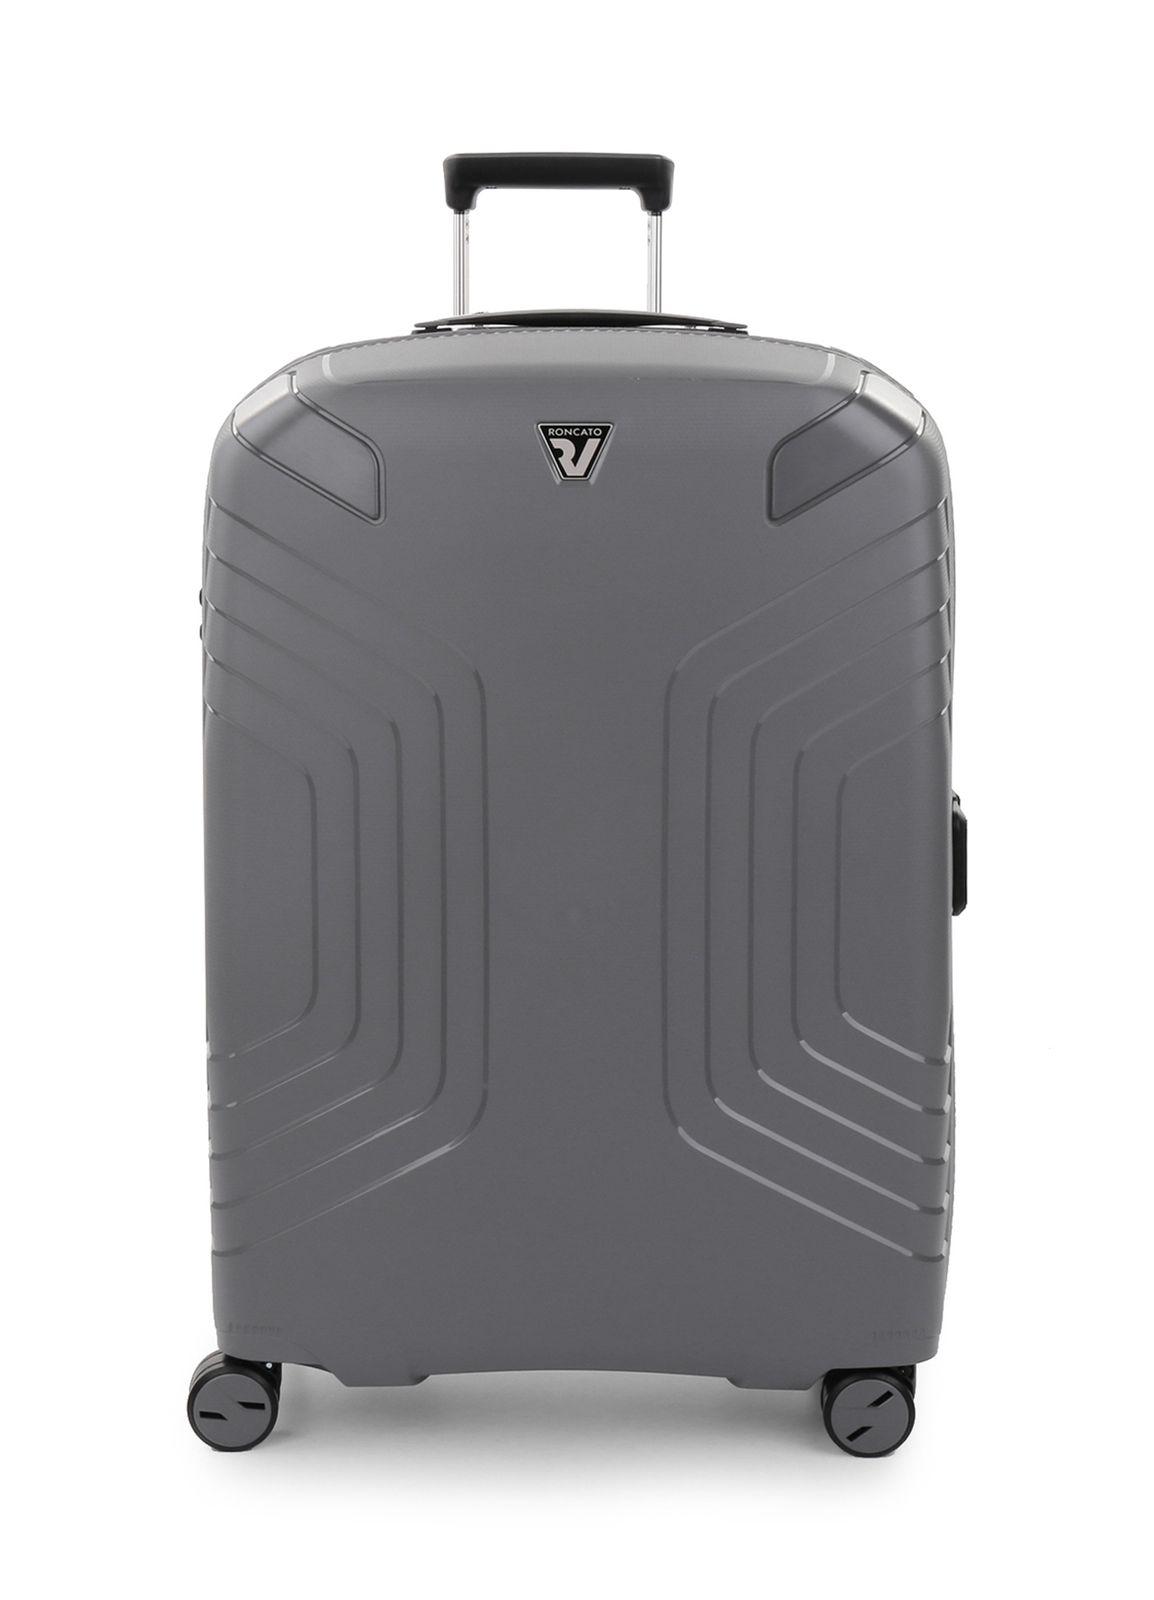 RONCATO Ypsilon Large Luggage L Lead